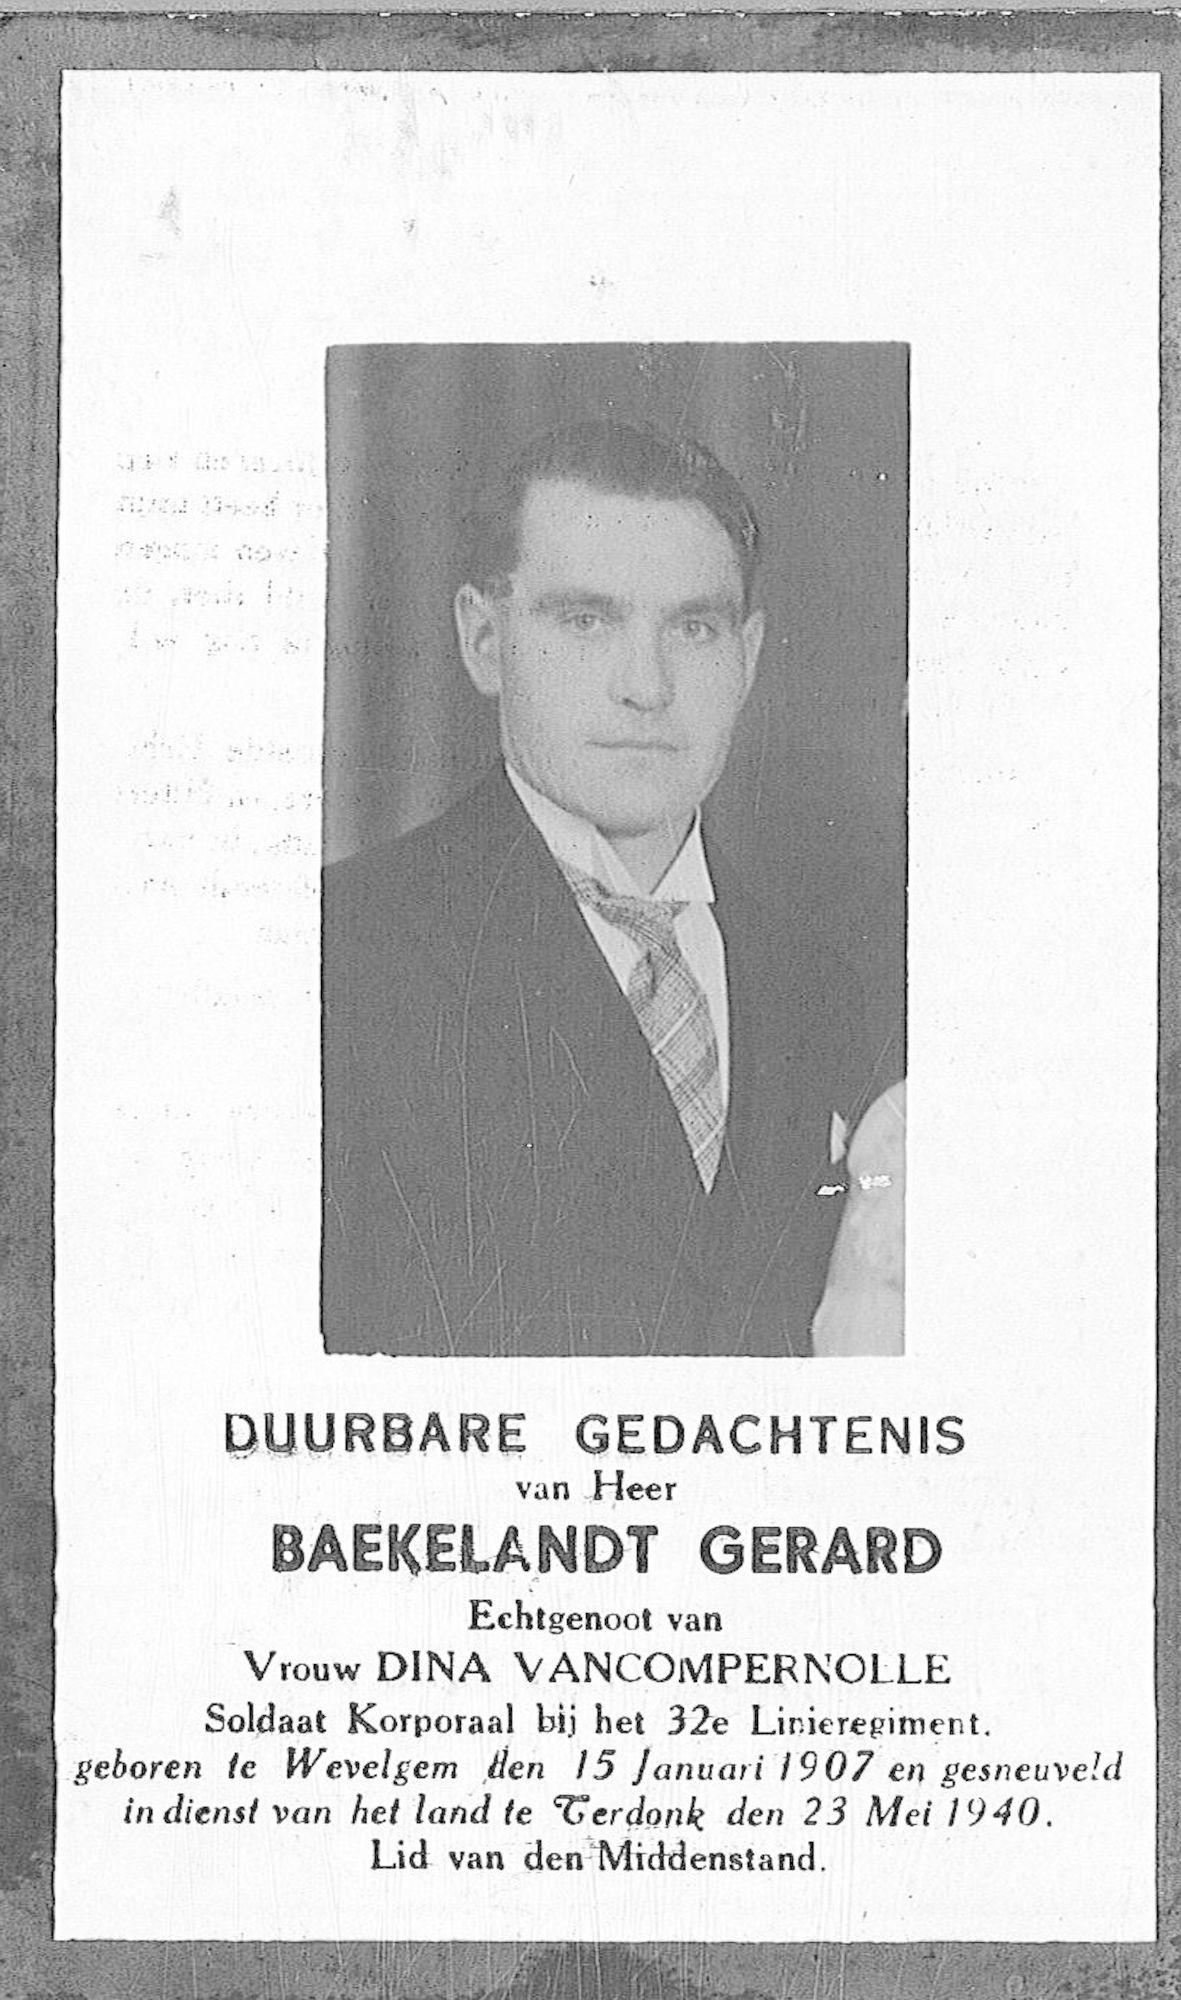 Gerard Baekelandt